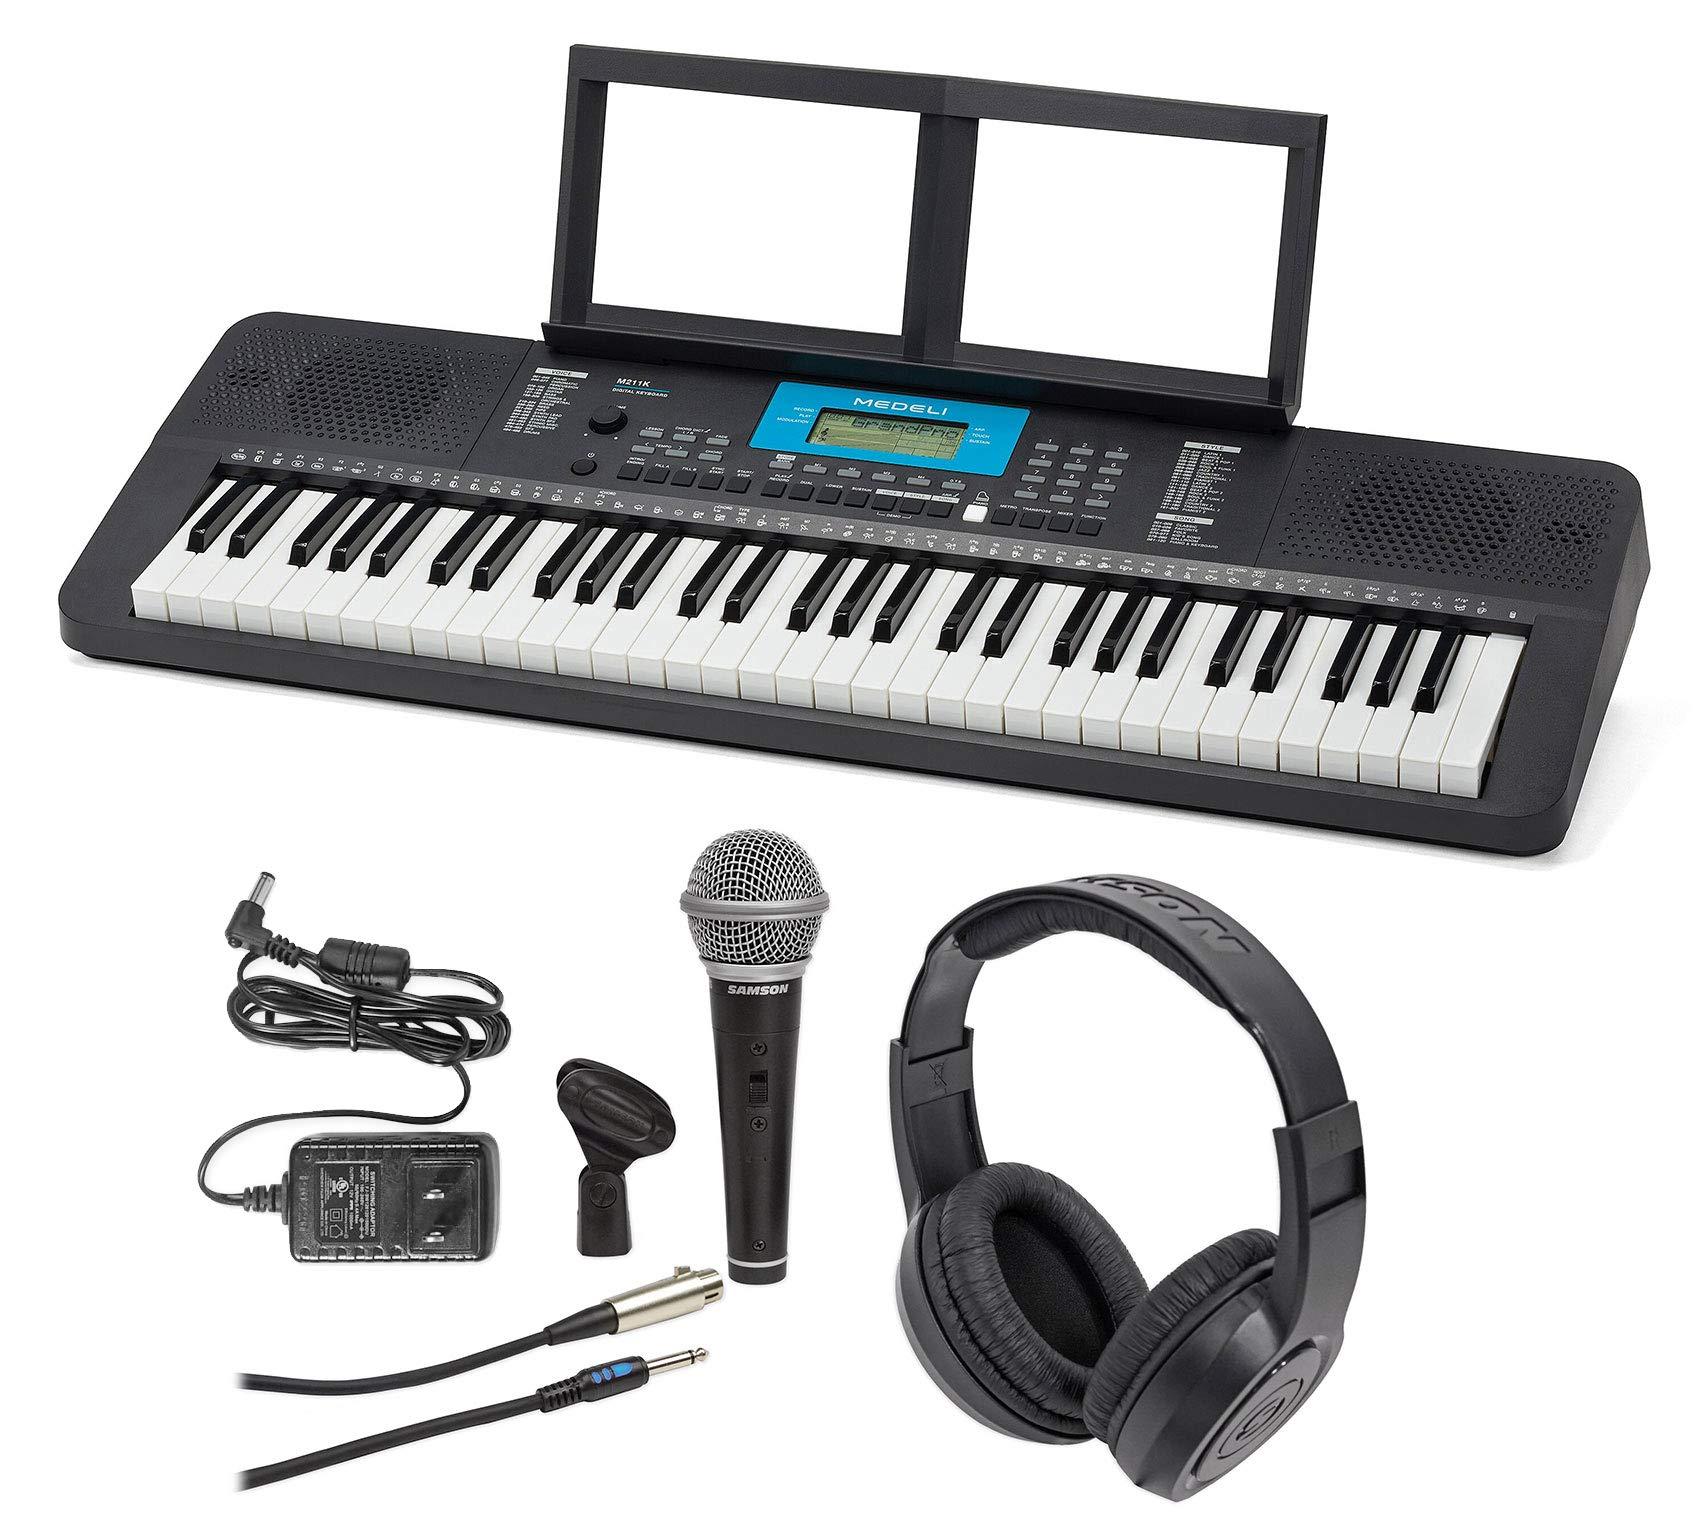 MEDELI M211K 61-Key USB MIDI Keyboard 32-Note Polyphony+Mic+Headphones+Adapter